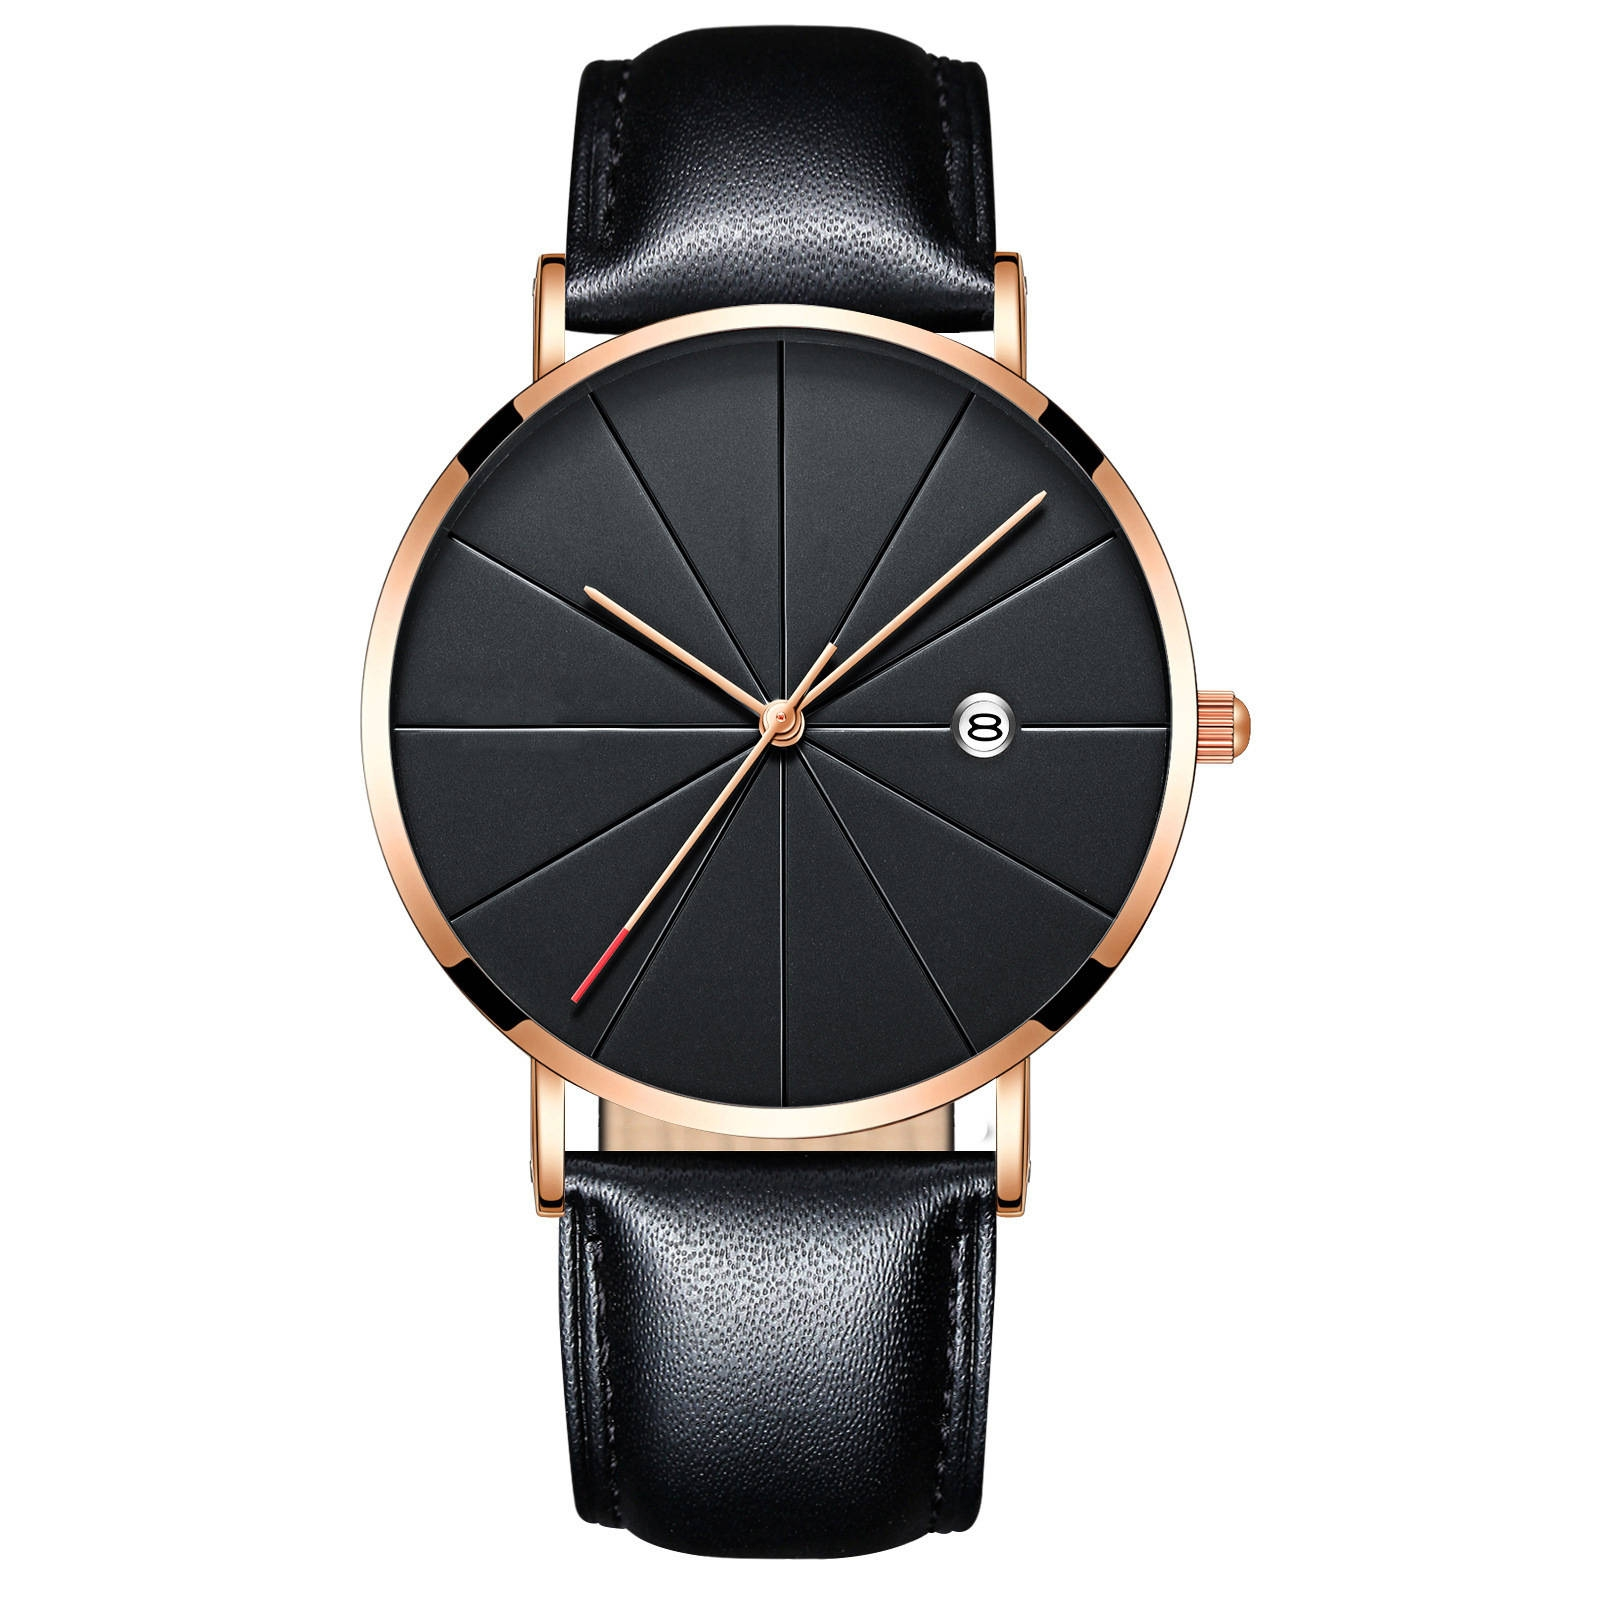 Luxury Watches Men Blue Stainless Steel Ultra Thin Watches Men Classic Quartz Date Men's Wrist Watch black+rose gold 25cm 2